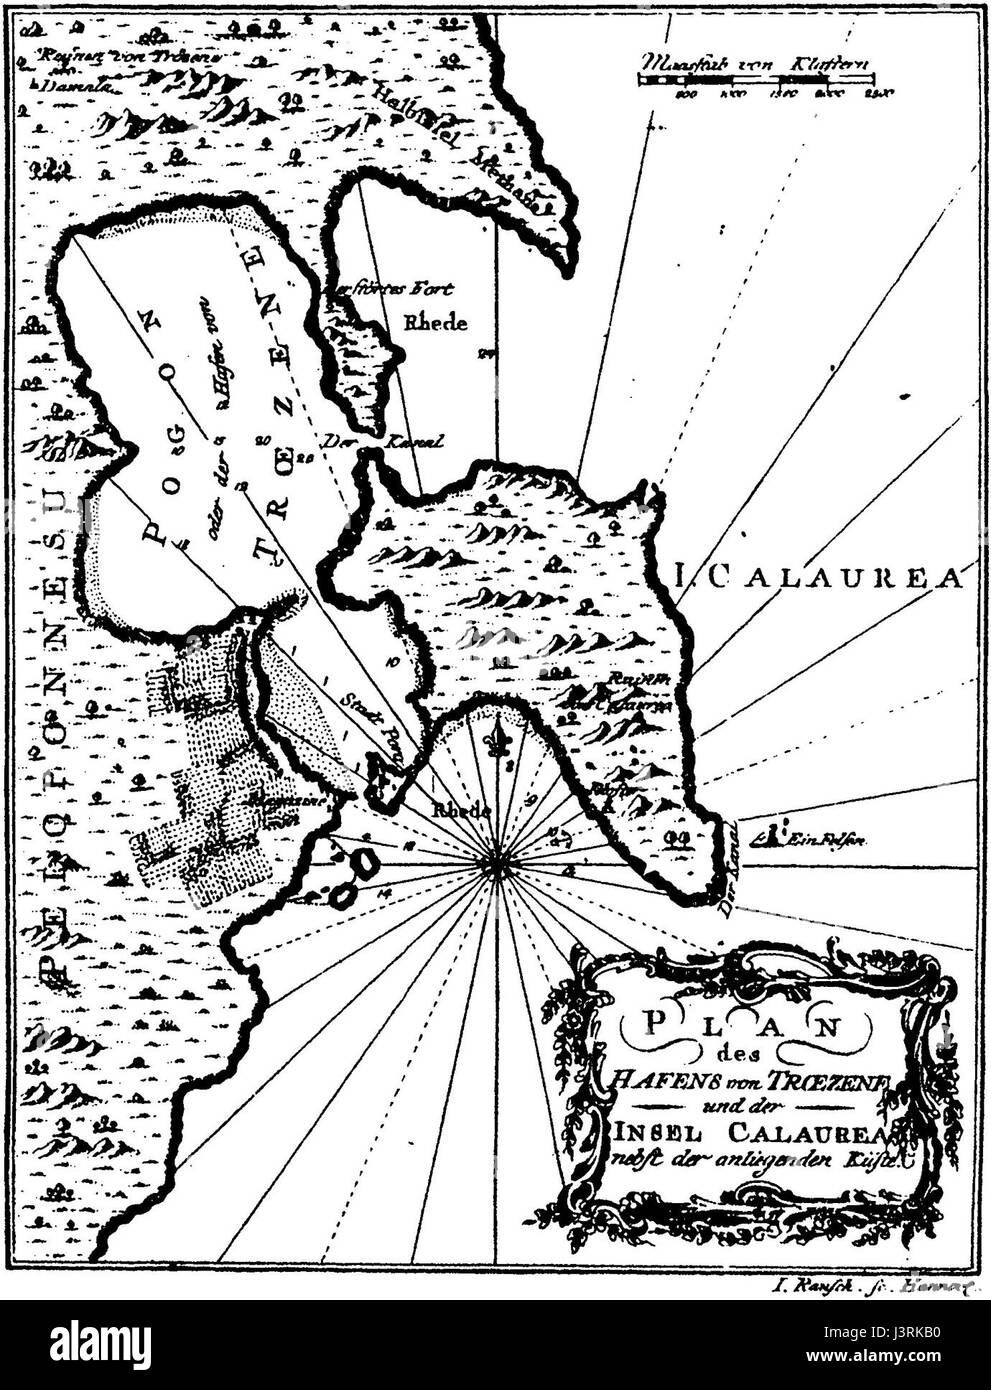 Insel Calaurea 1 - Stock Image